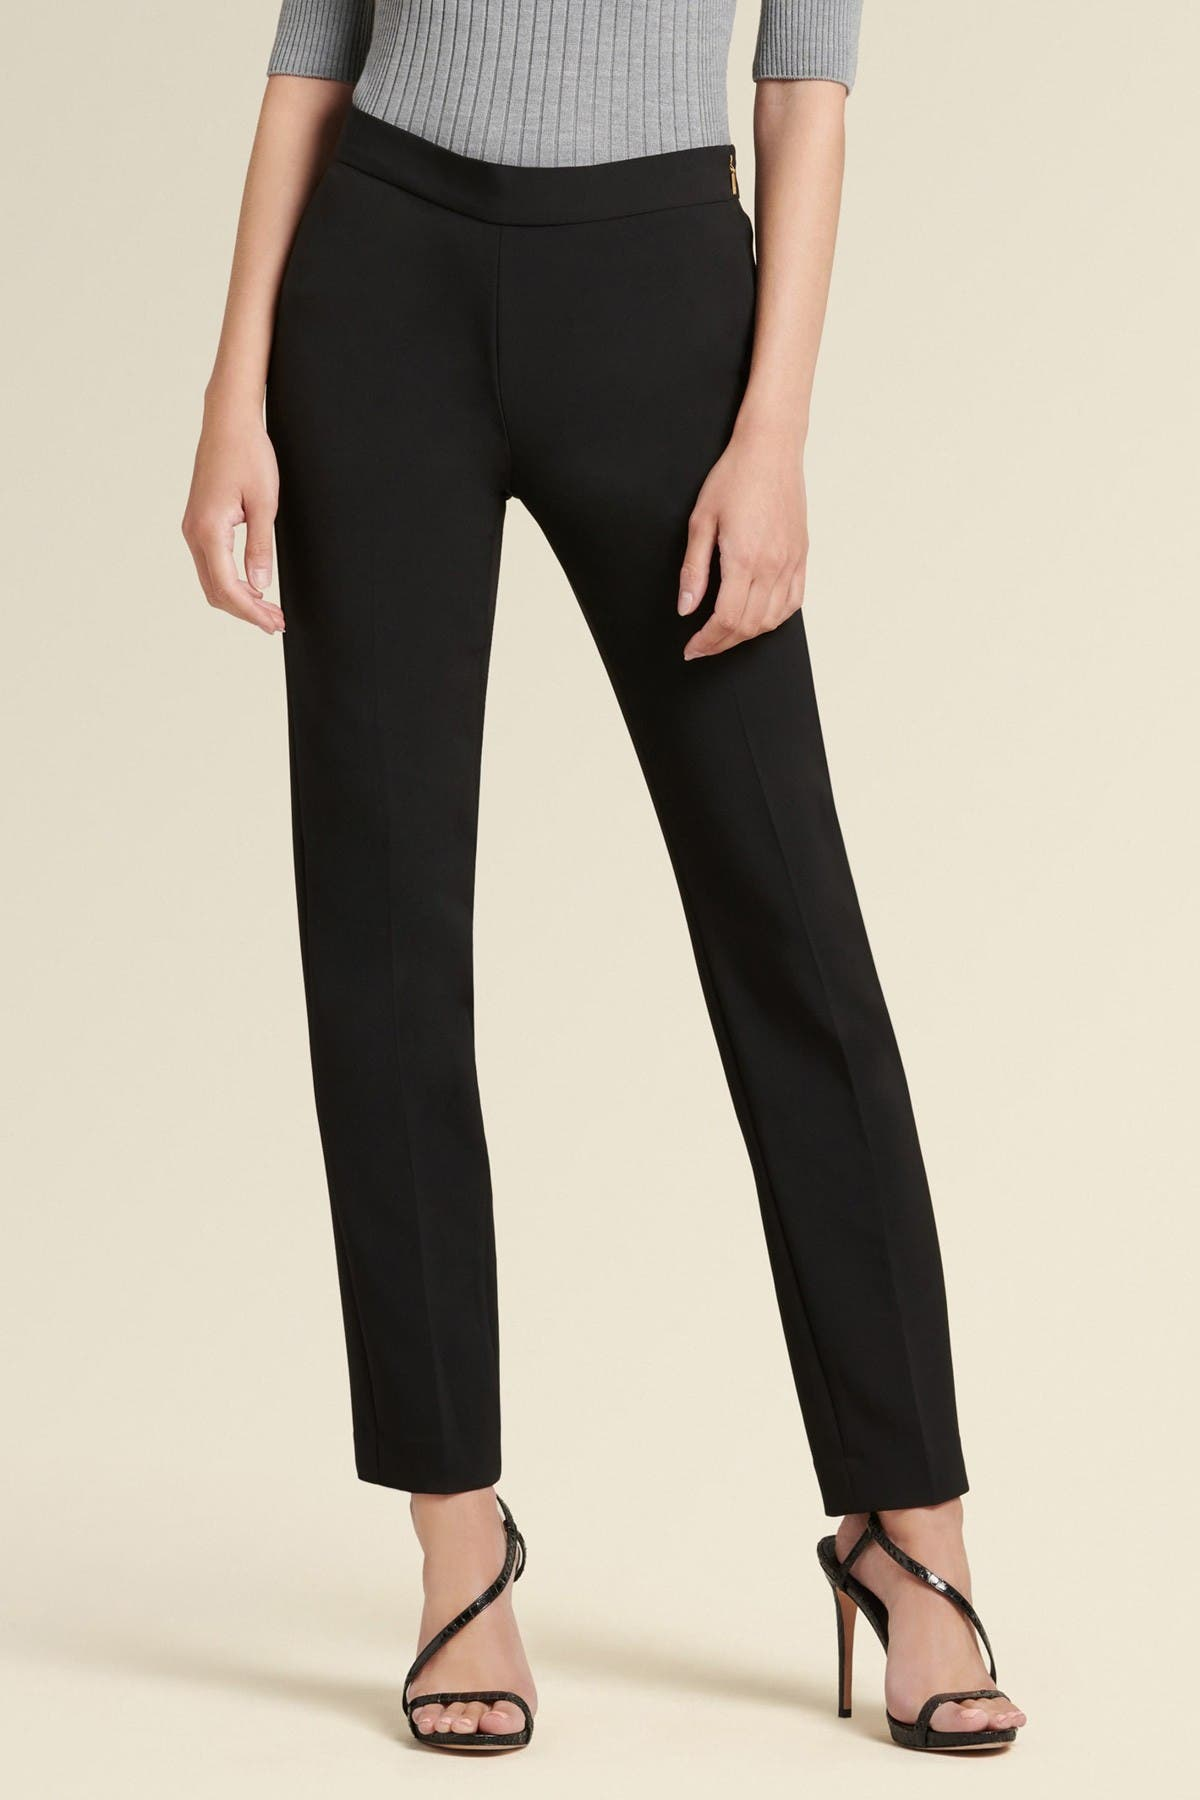 Image of DKNY Side Zip Straight Leg